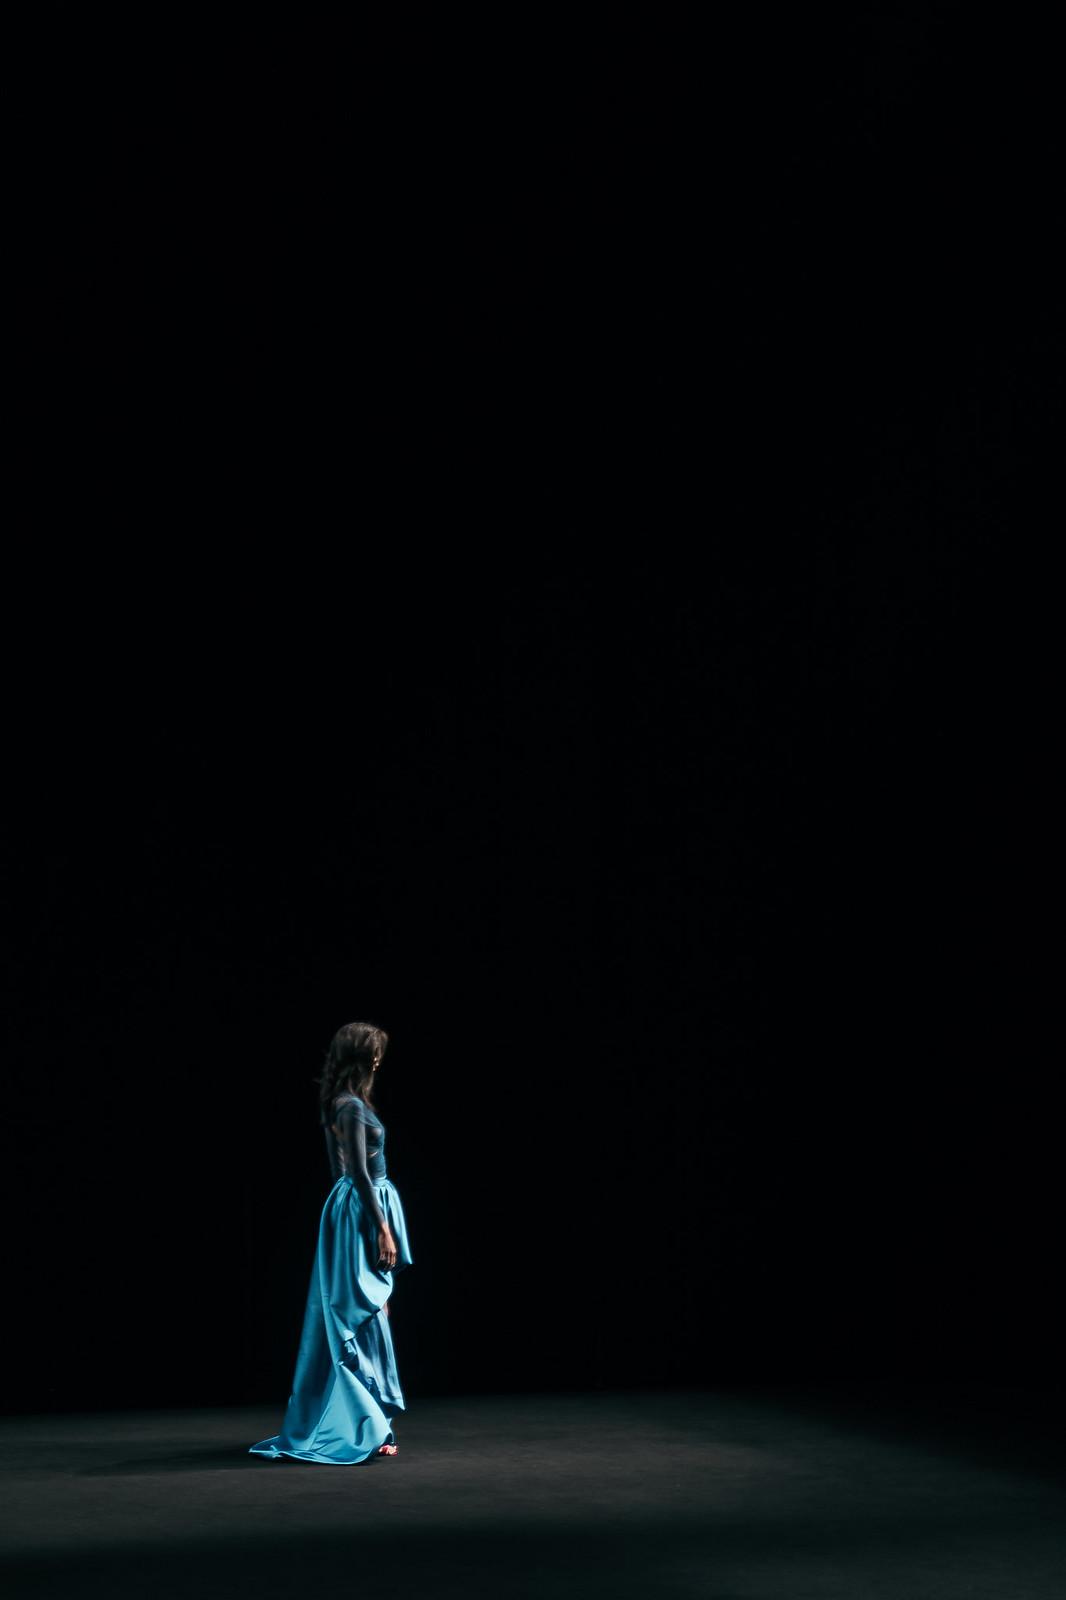 Jessie Chanes - Seams for a desire - 080 Bacelona Fashion #080bcnfasion -60